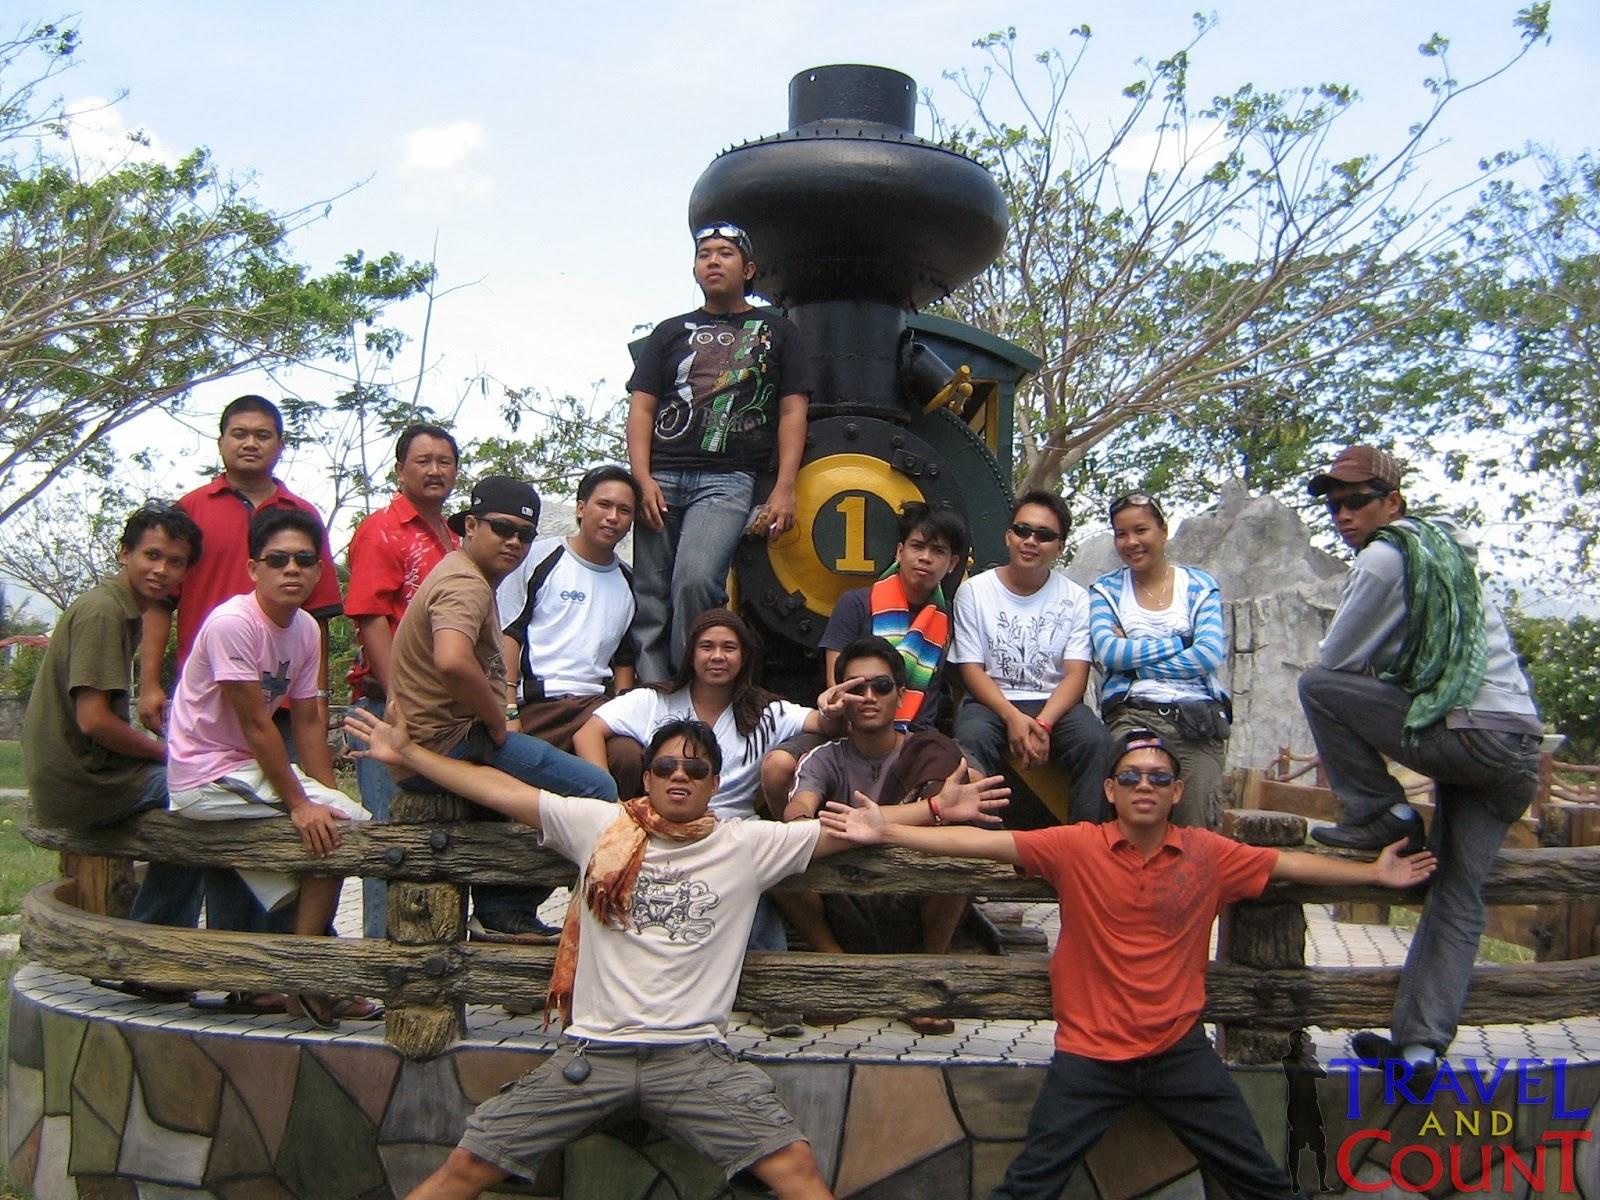 San Carlos Train in Negros